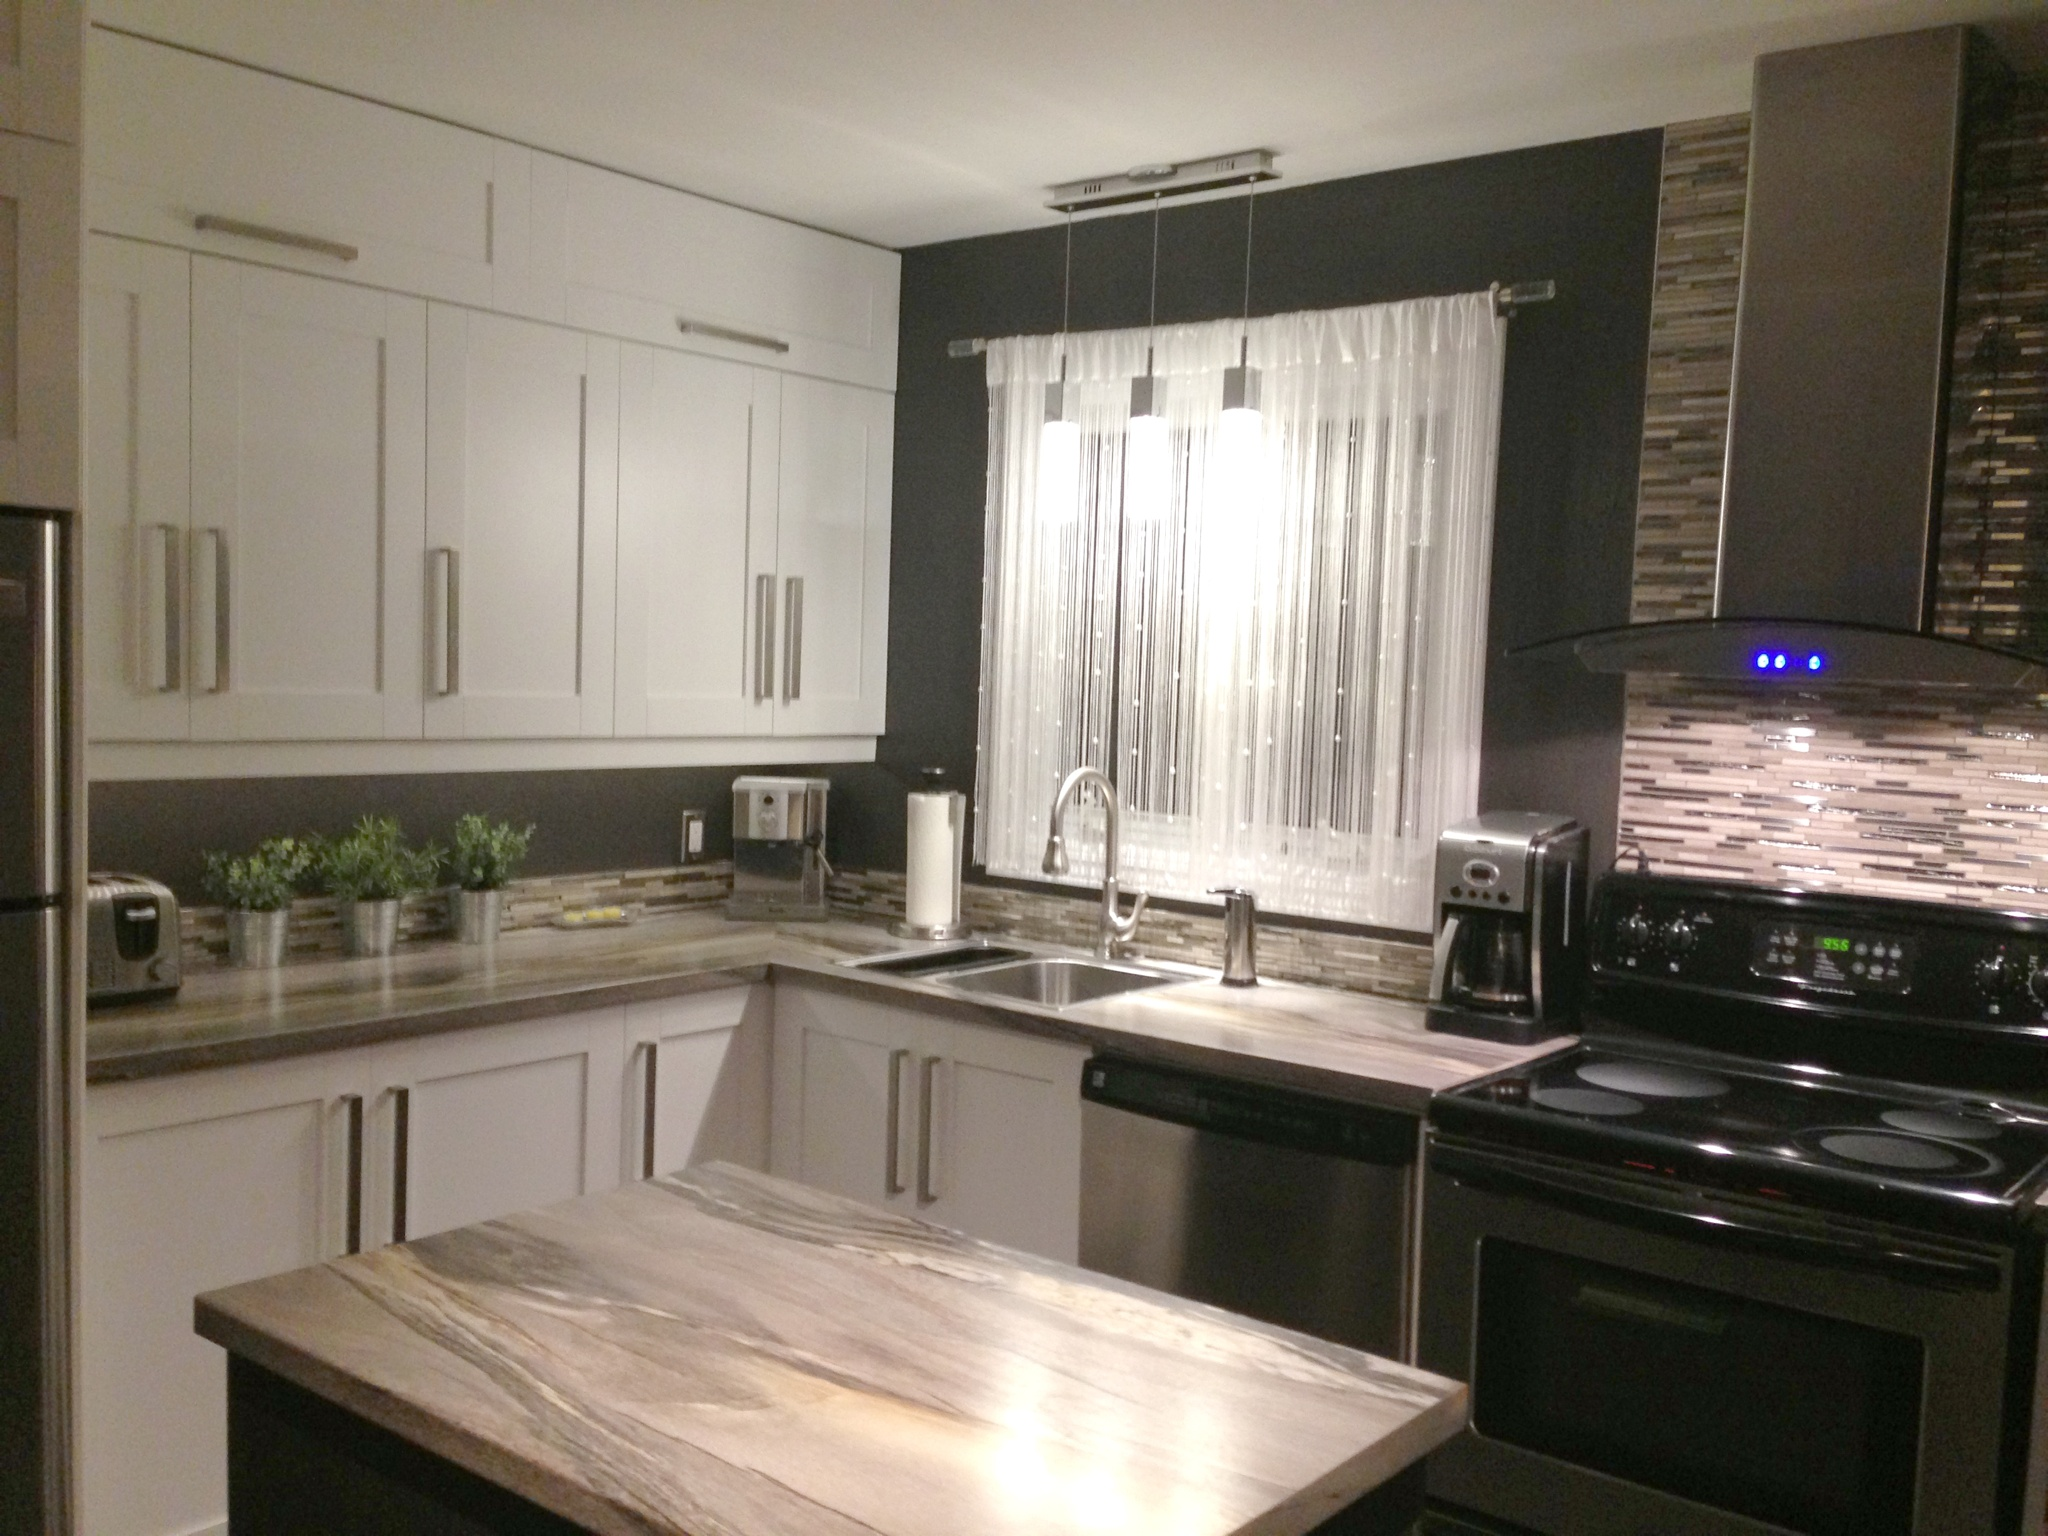 petite et coquette cuisine new zone. Black Bedroom Furniture Sets. Home Design Ideas